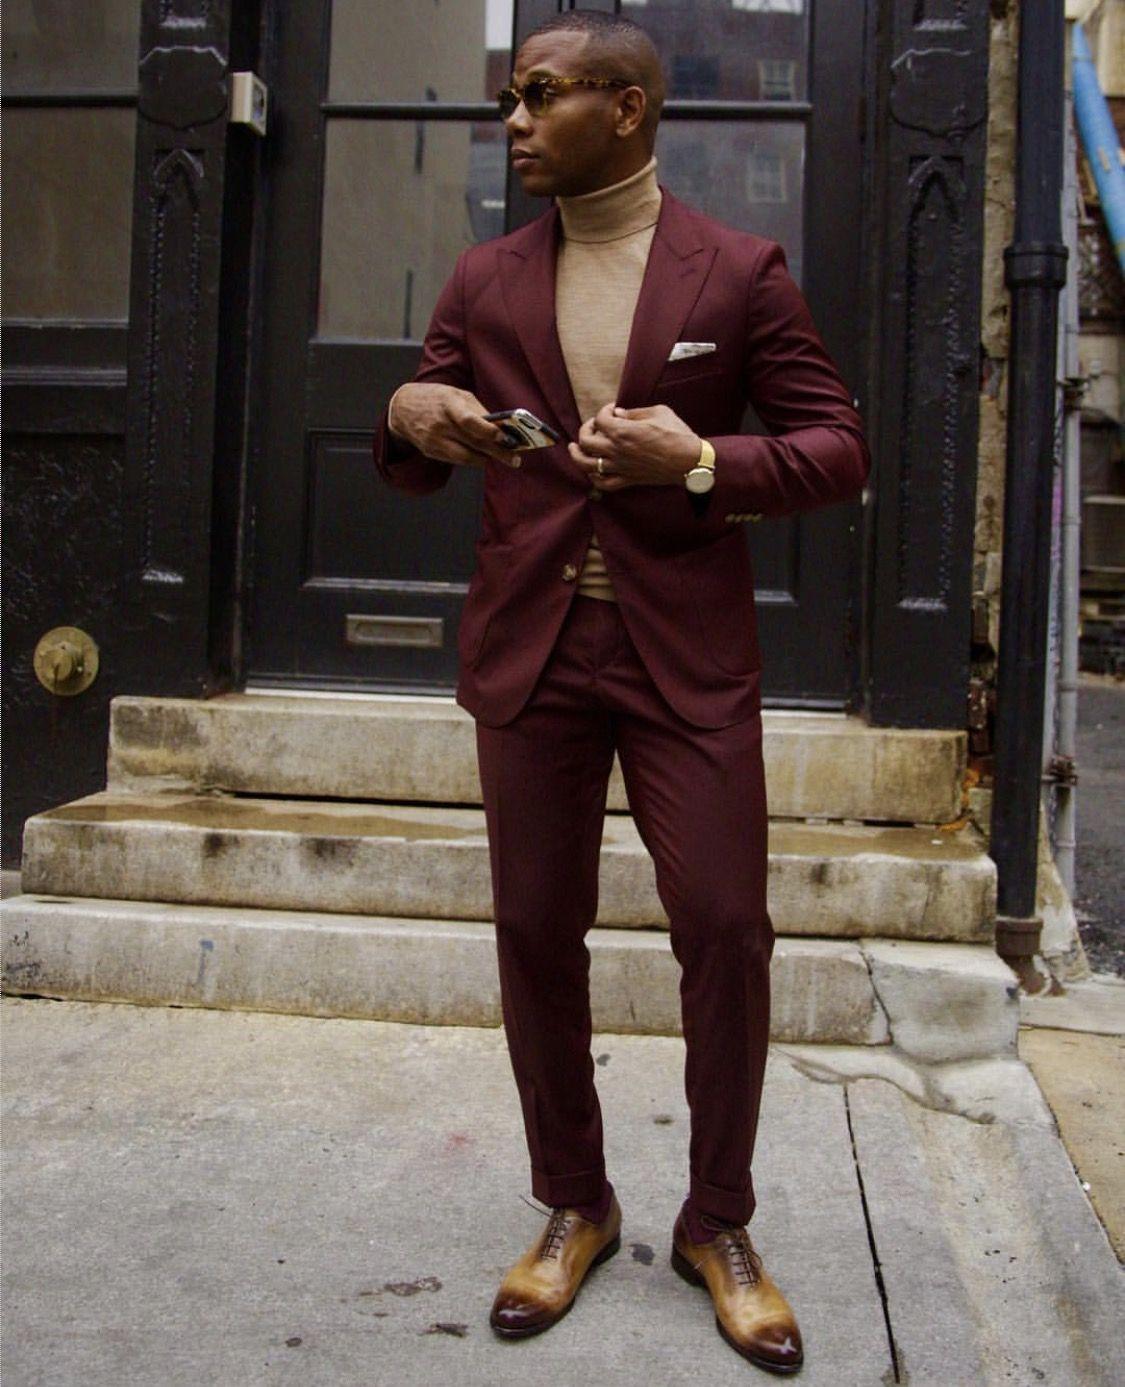 Burgundy Suit Tan Turtleneck Shoes And Pocket Square